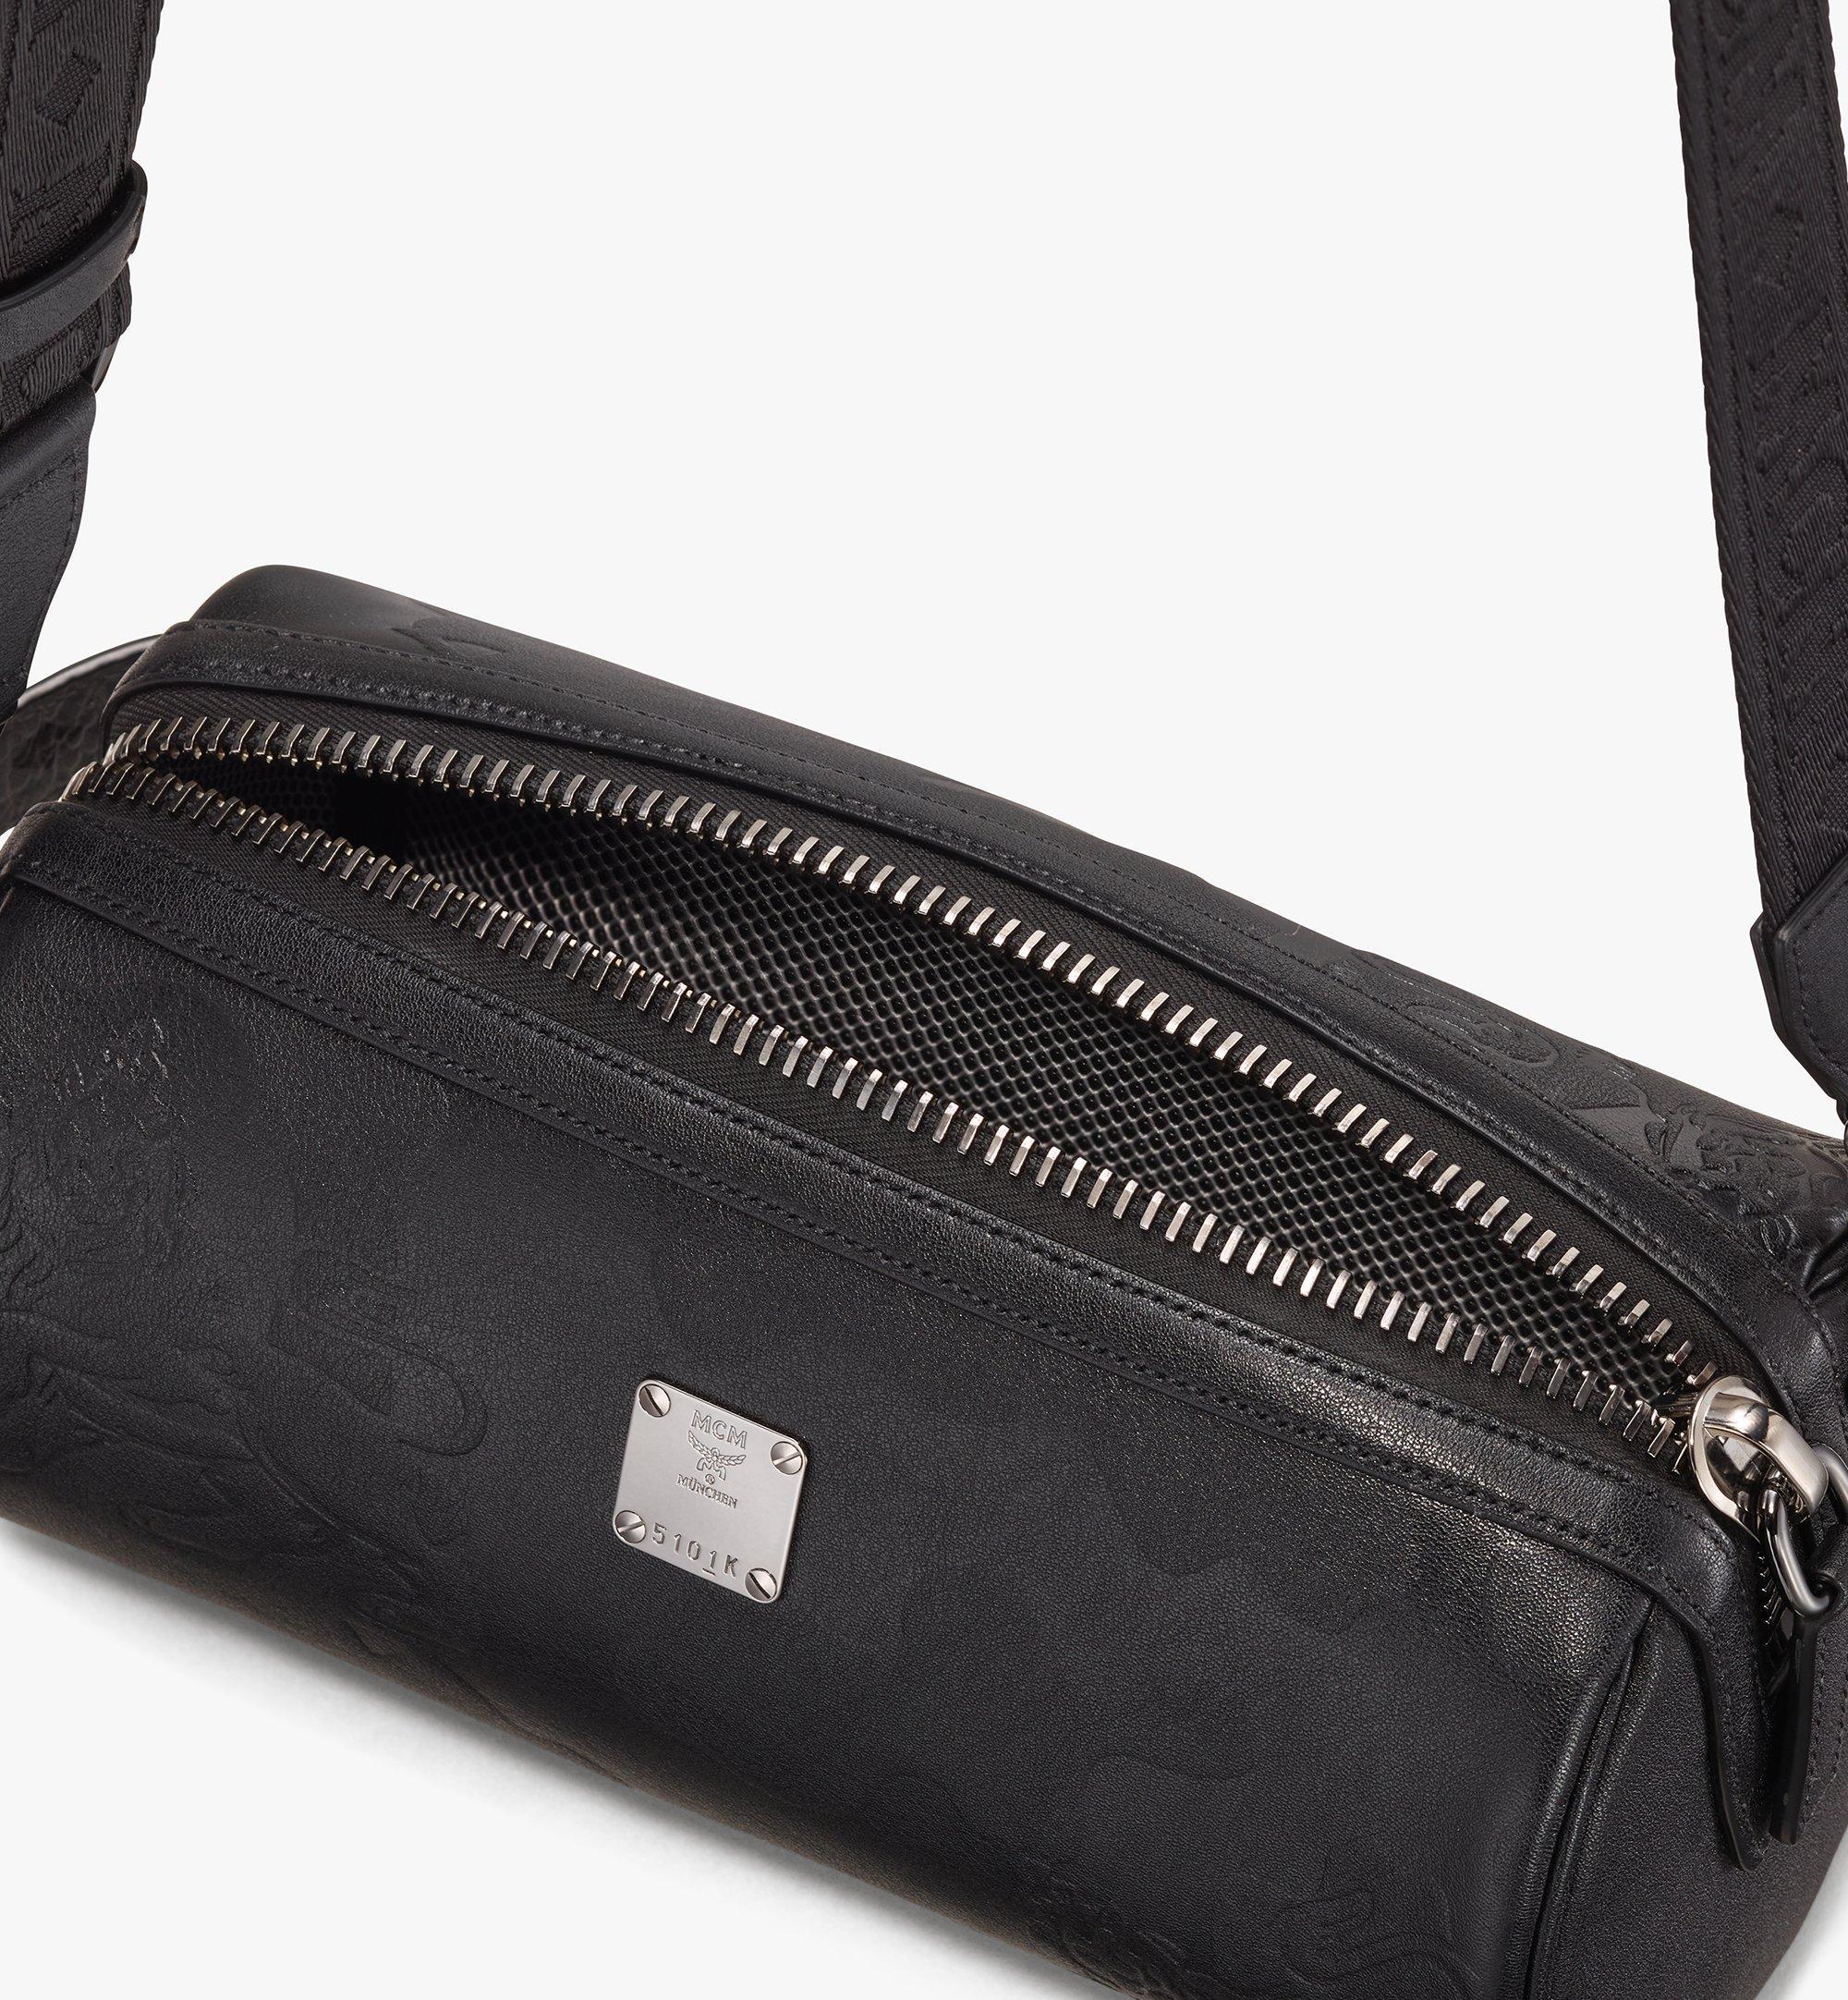 MCM Crossbody Bag in Embossed Lion Camo Black MUR9AES02BK001 Alternate View 4